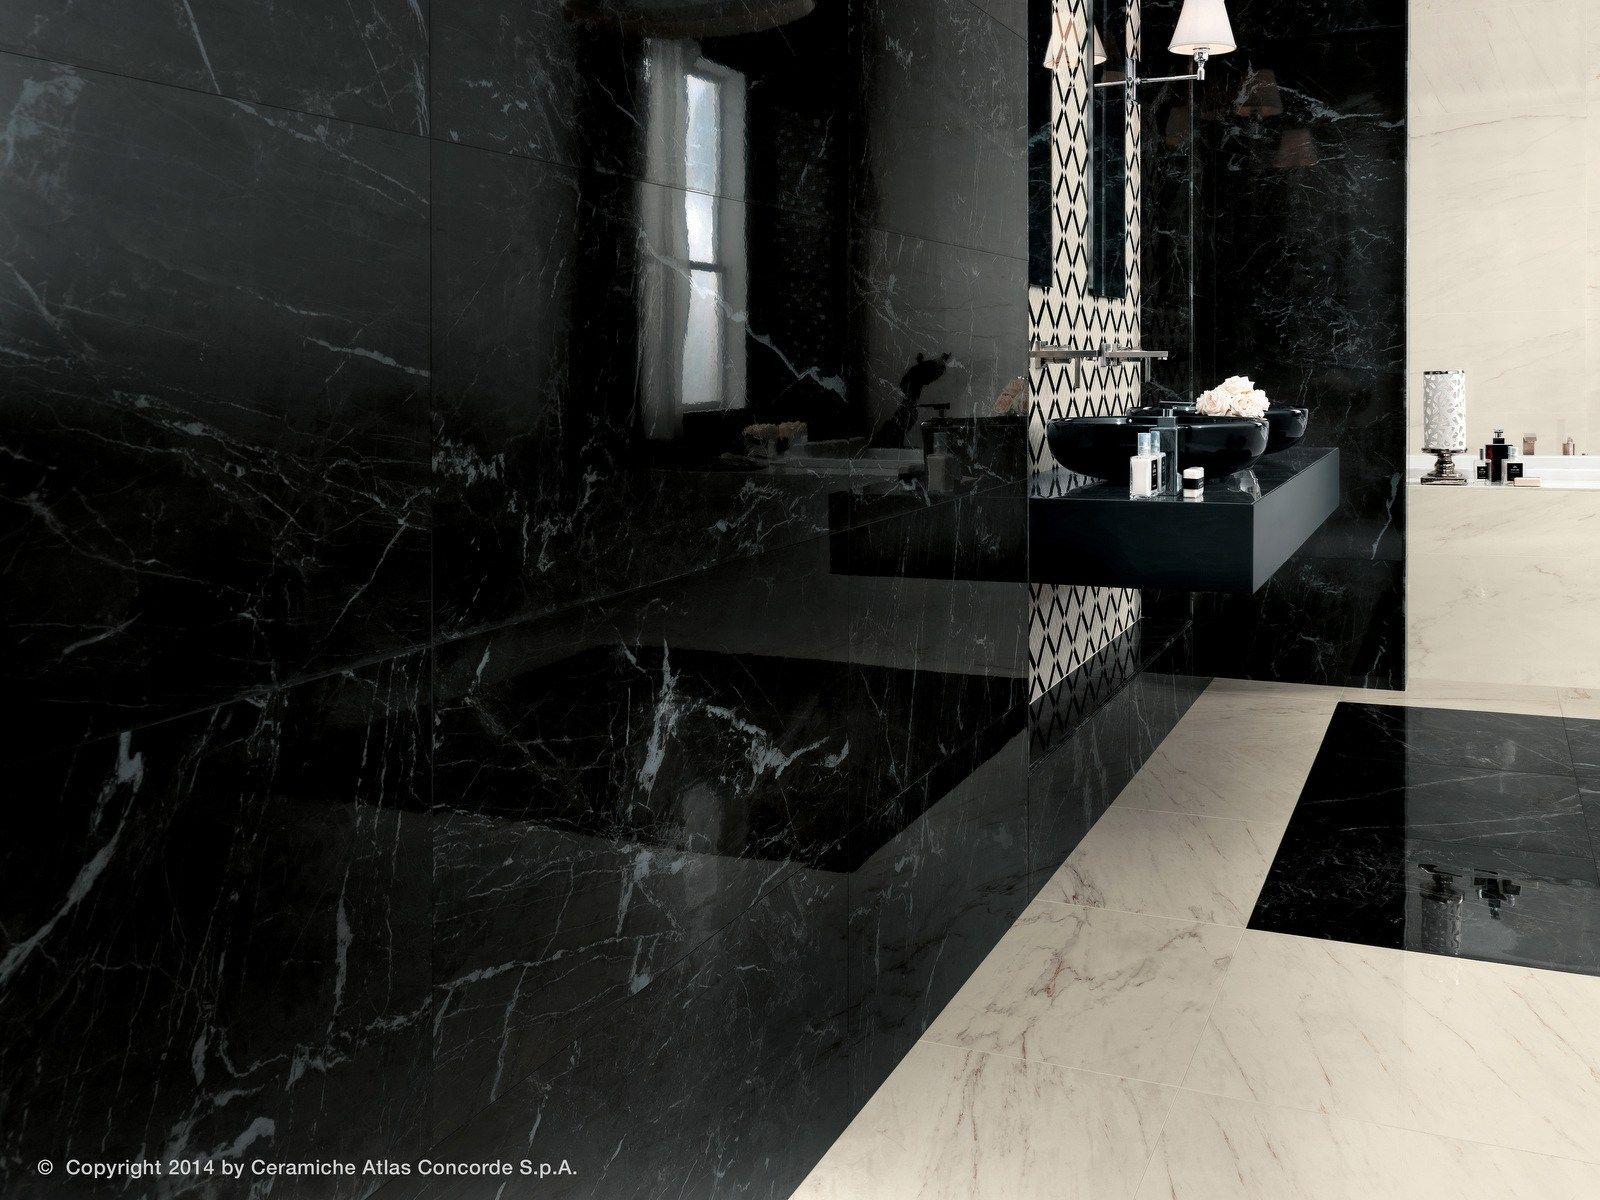 Marvel pro wall rivestimento in ceramica a pasta bianca collezione marvel pro by atlas concorde - Carrelage atlas concorde ...